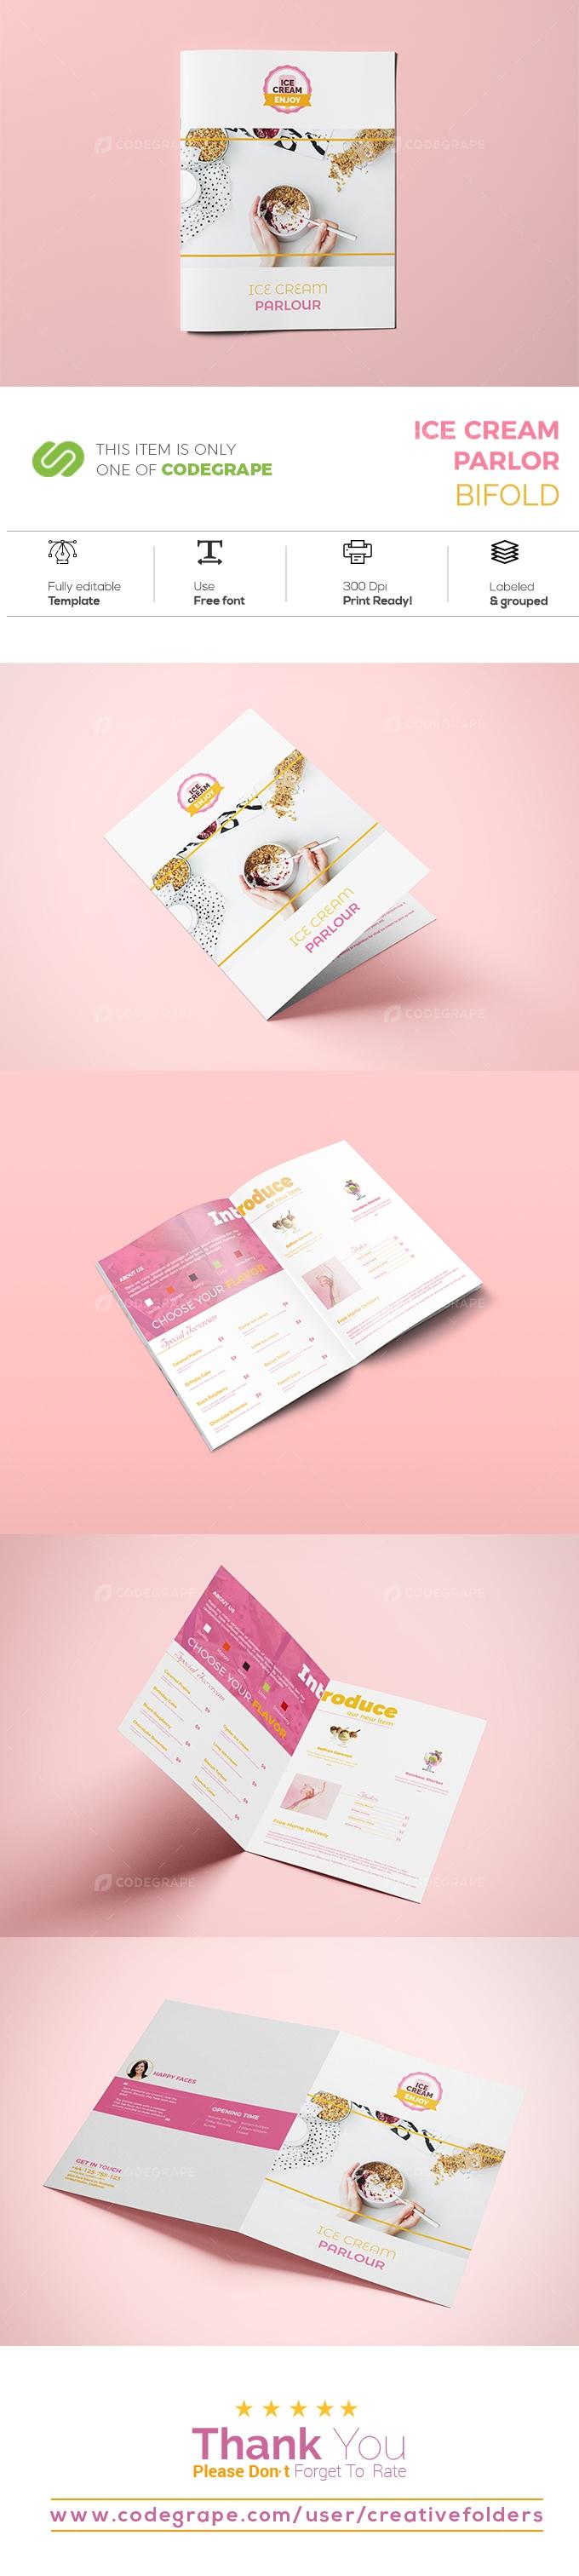 Ice Cream Parlor Bifold Brochure